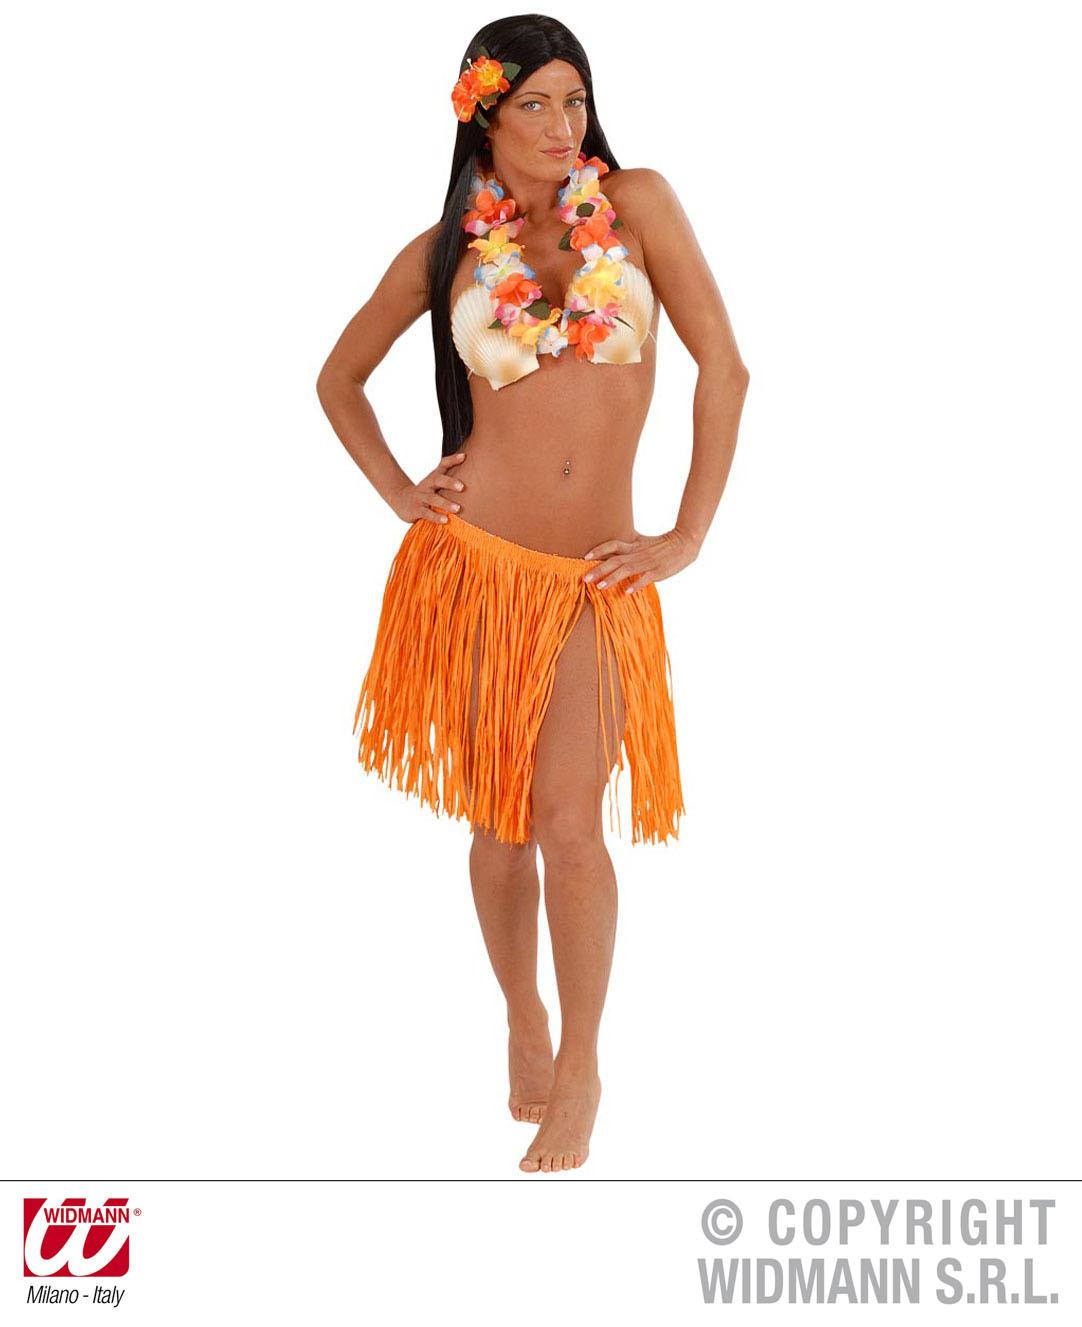 2 tlg.Hawaii Set, Rock ca. 45 cm u. Hawaii Kette orange,gelb, blau,pink